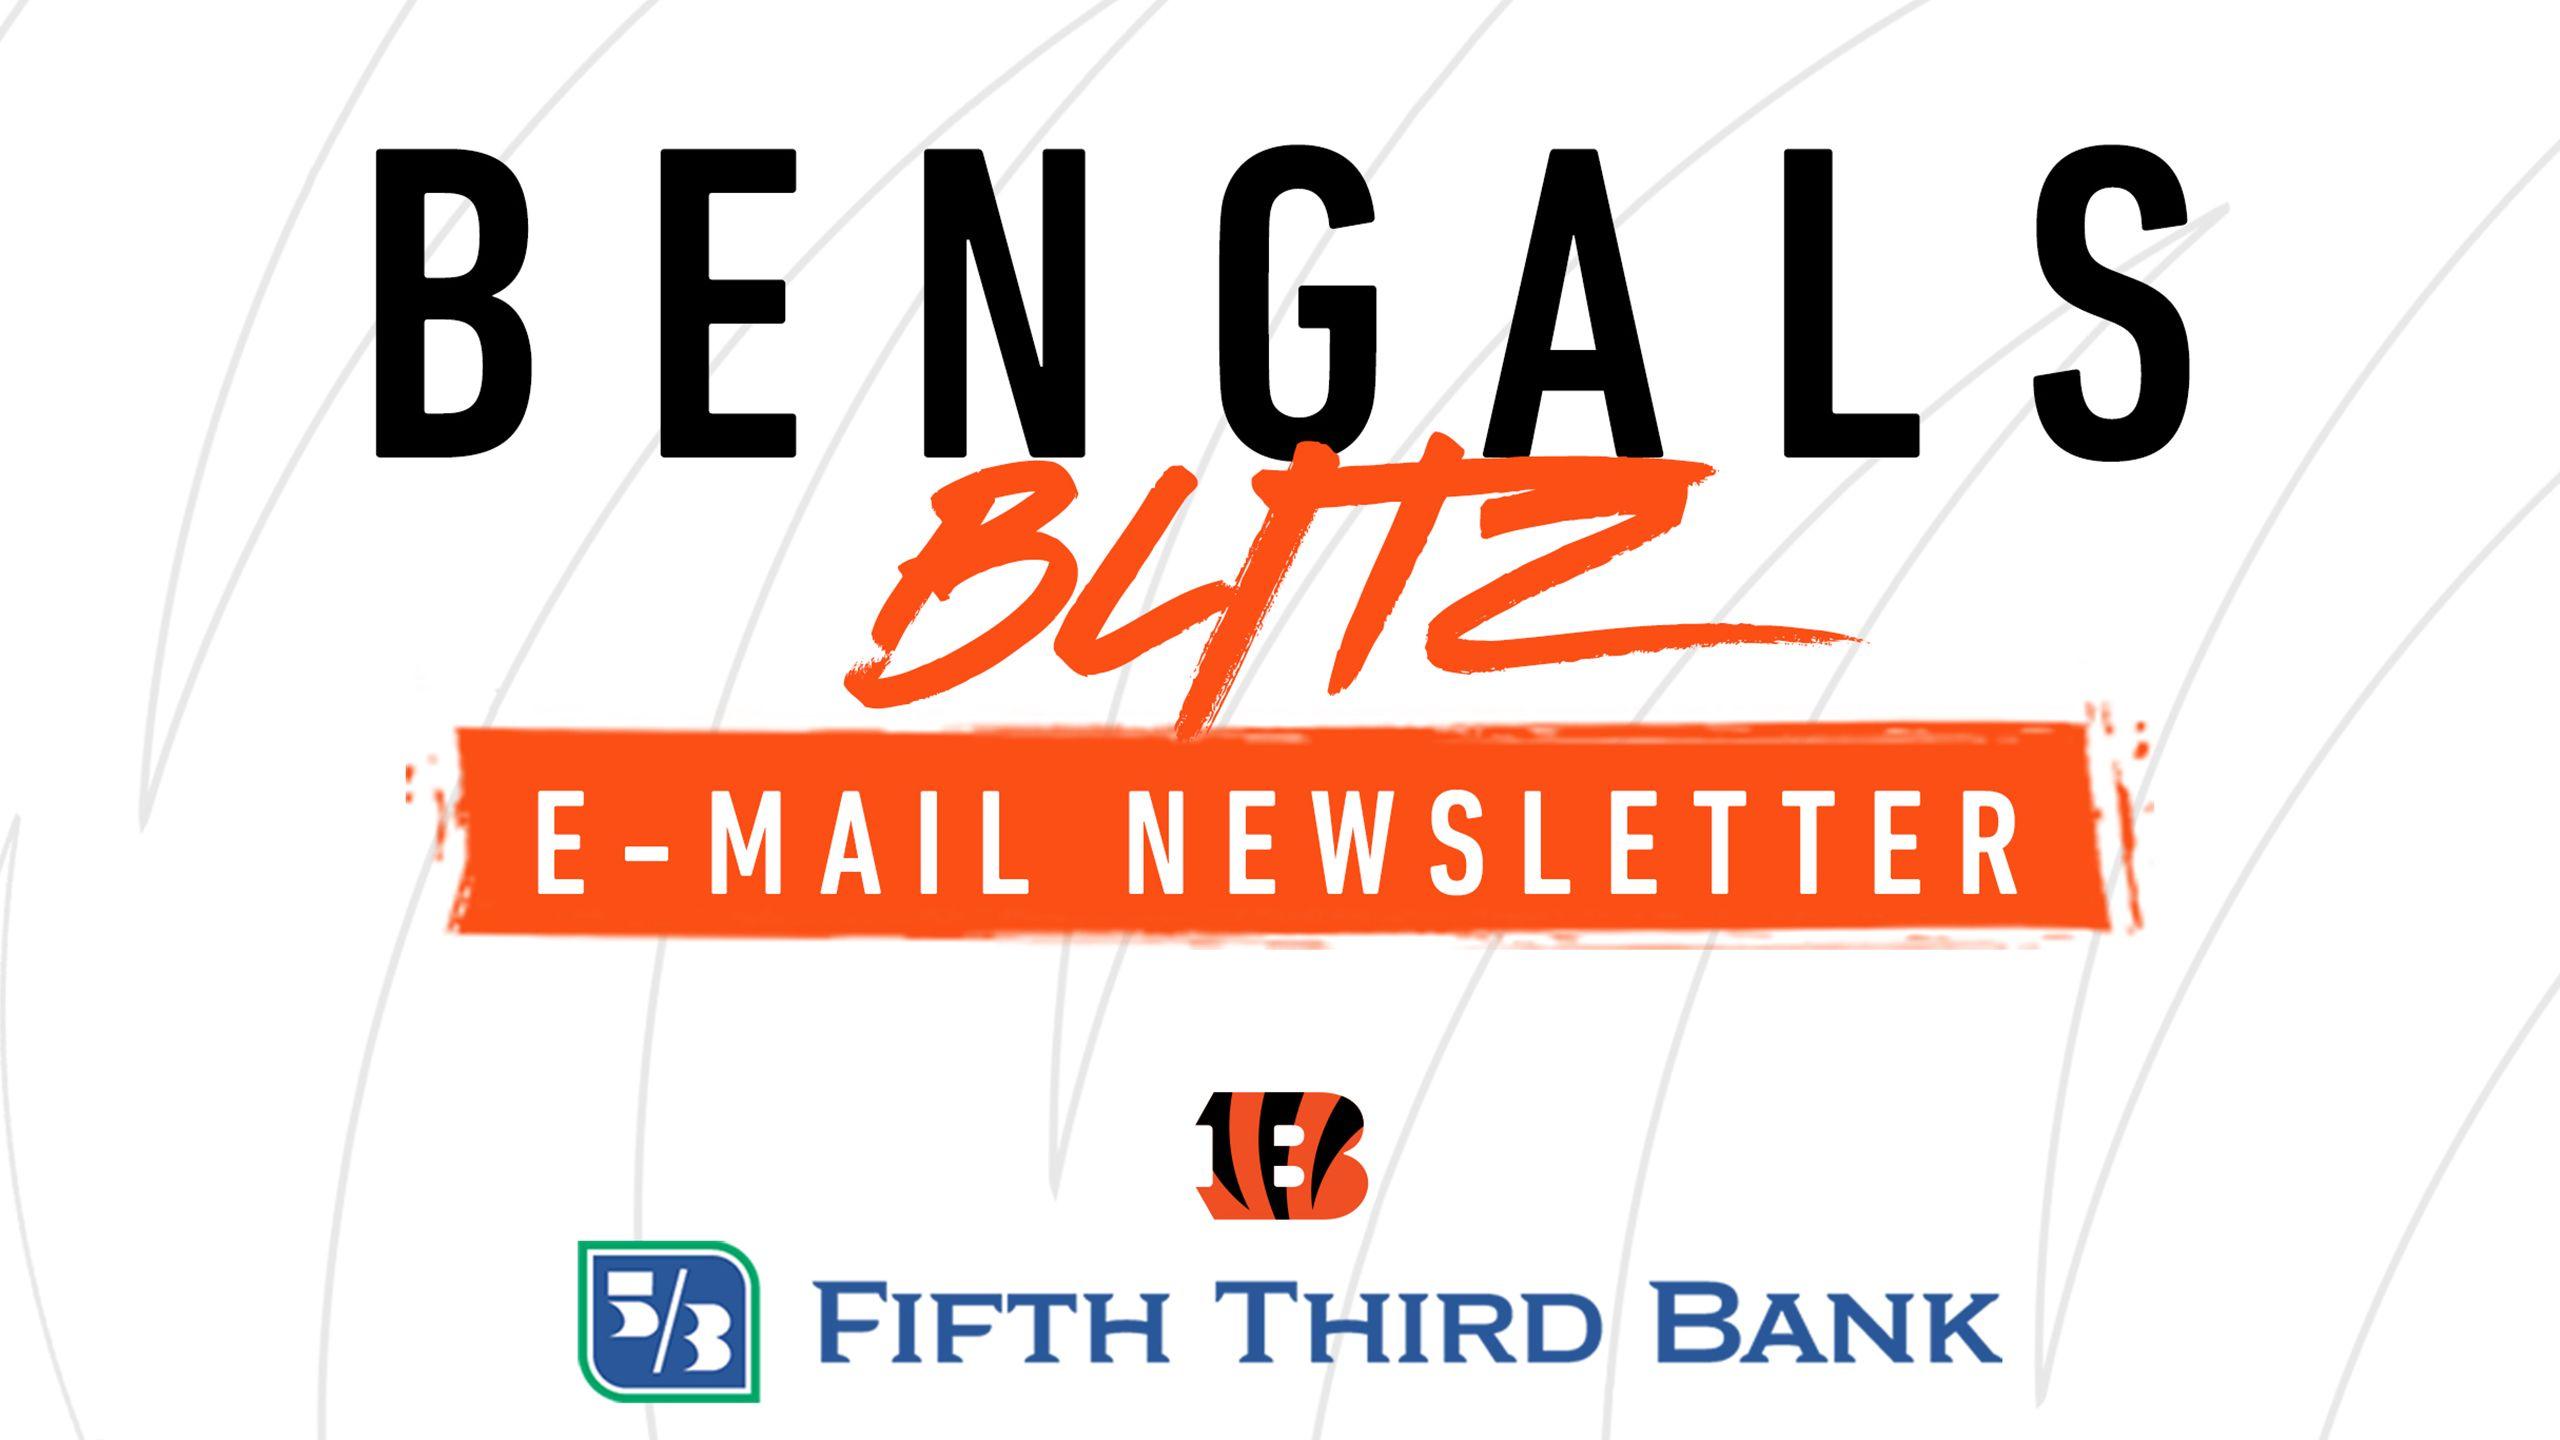 Bengals Blitz E-Newsletter